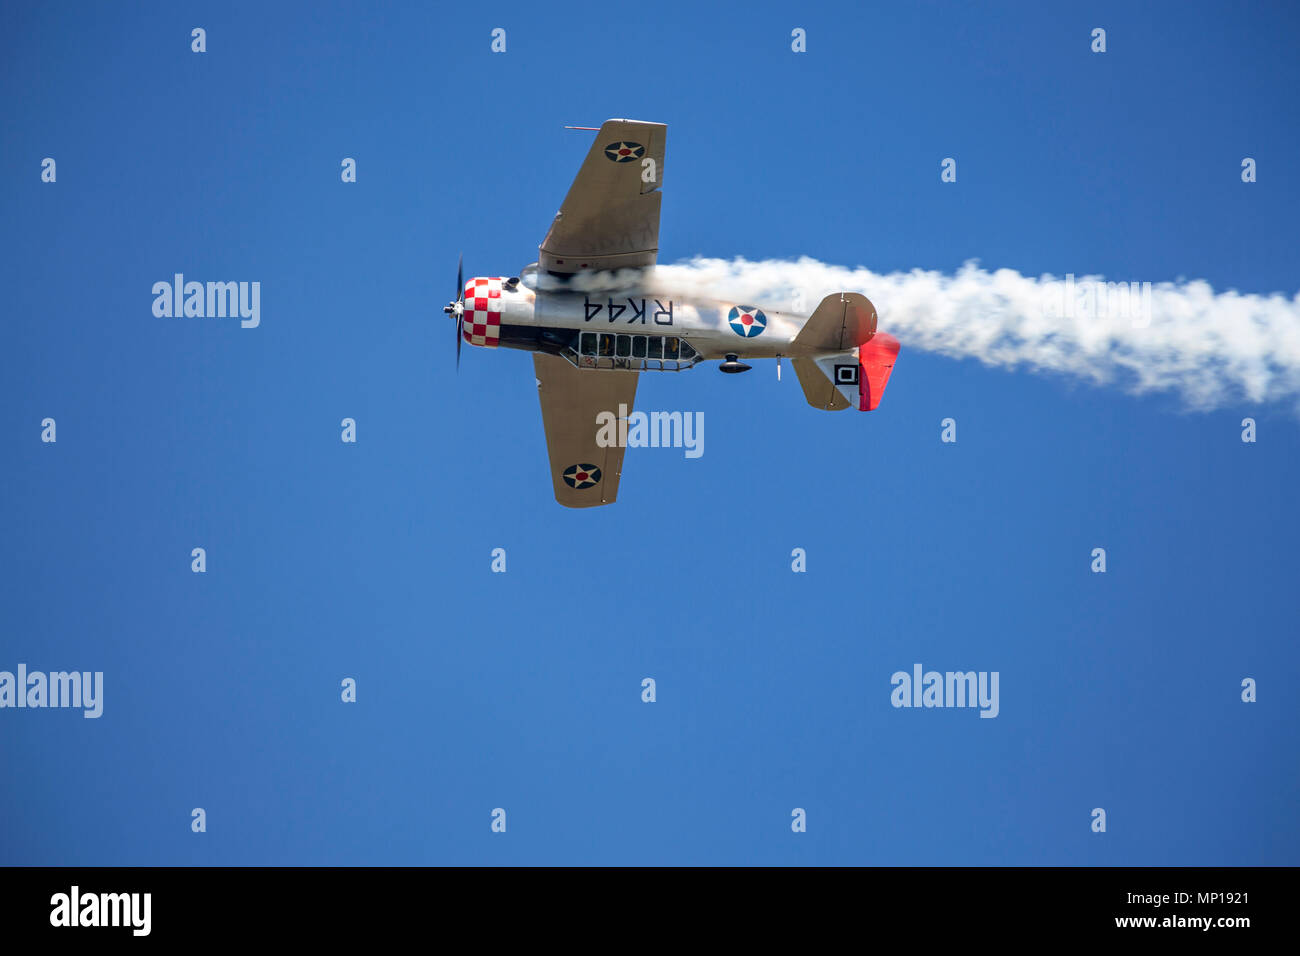 North American Texan aircraft at the Central Texas Airshow - Stock Image